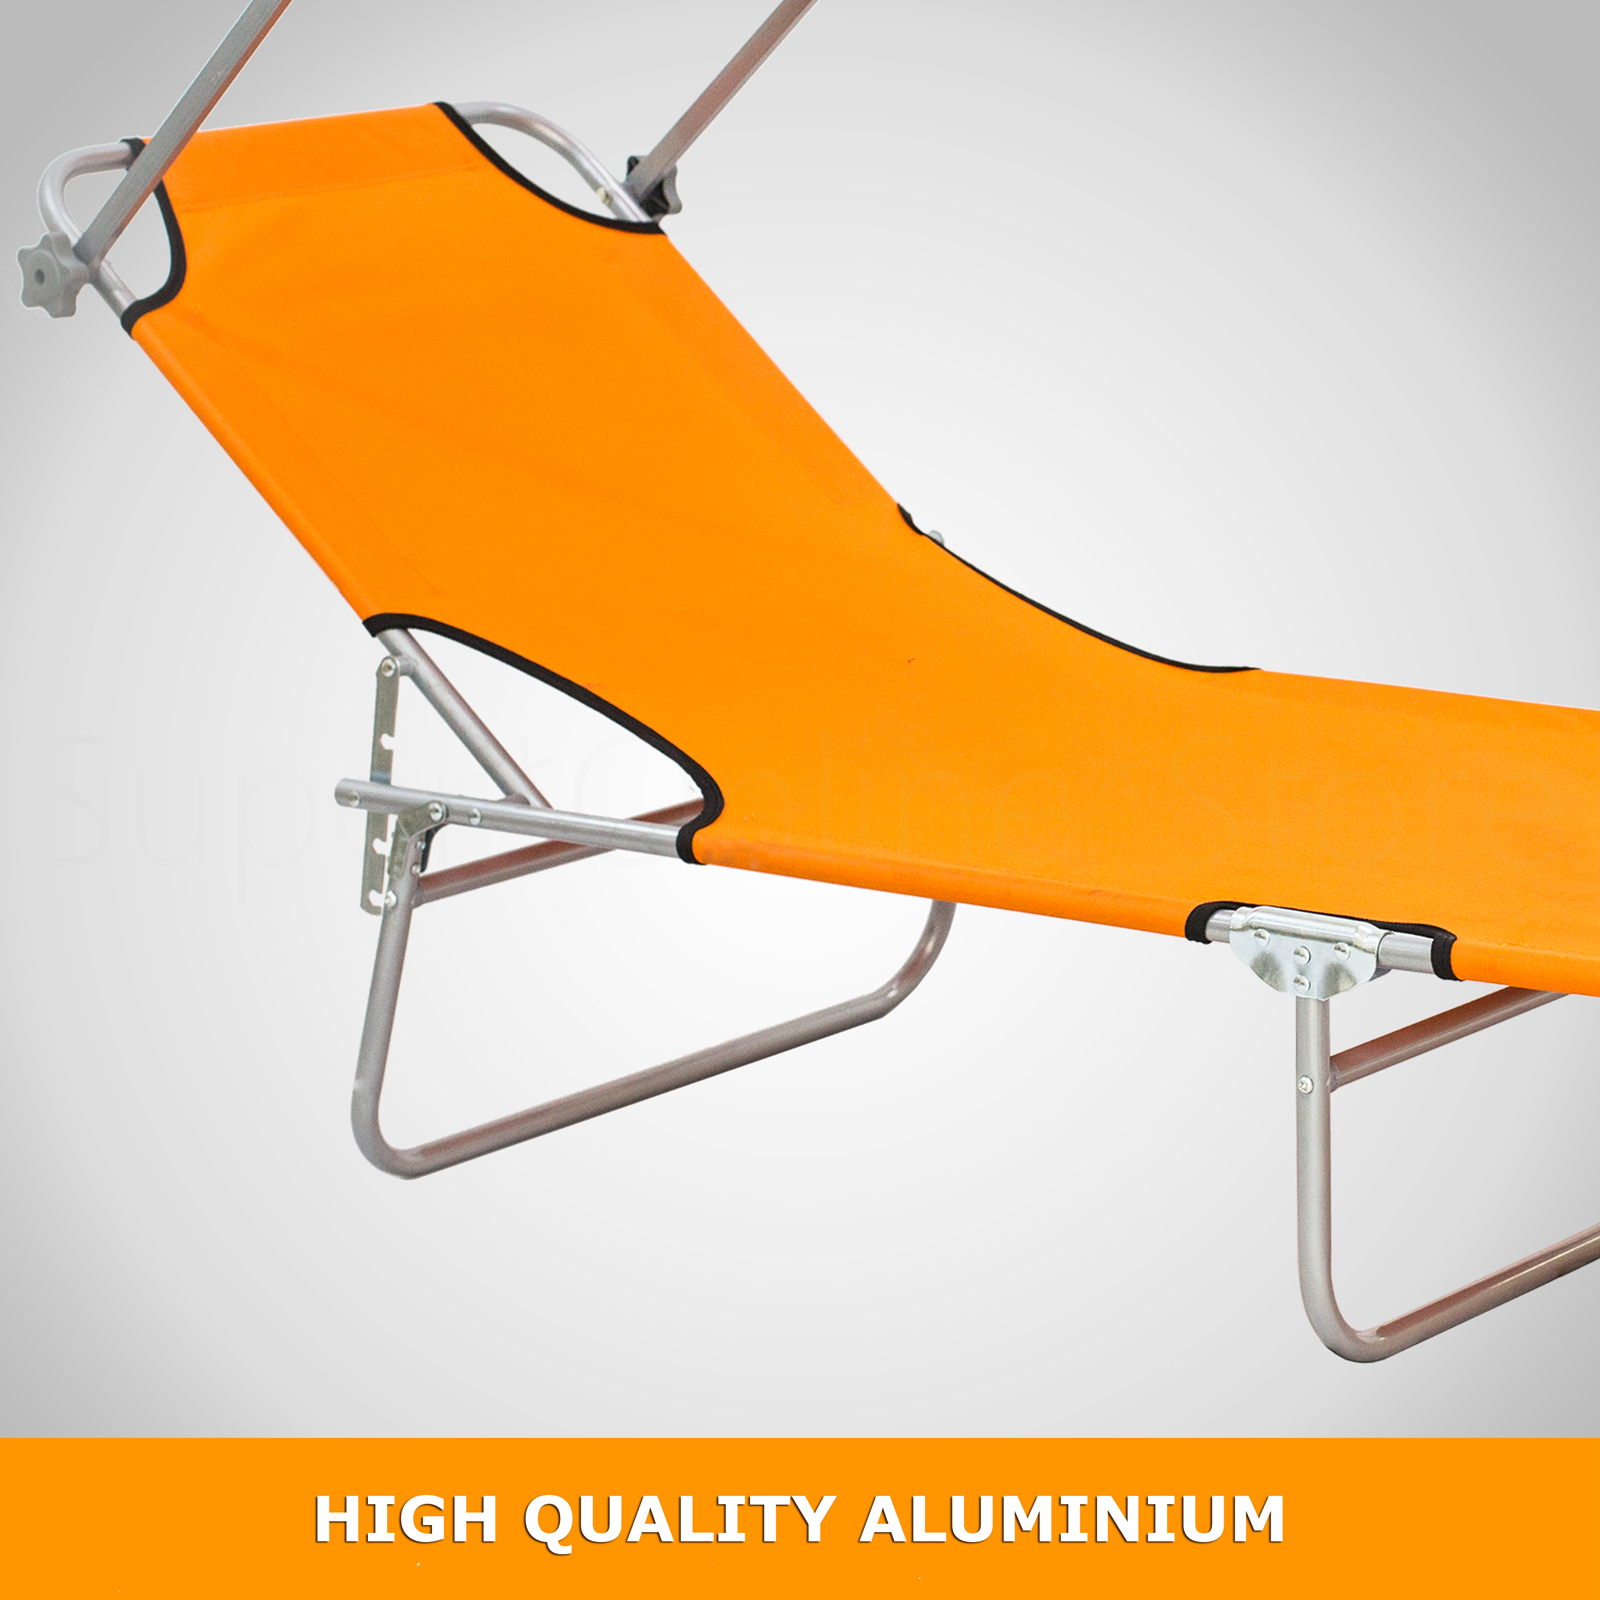 Aluminium Folding Reclining Sun Bed With Sunshade Lounge Pool Beach Chair Orange